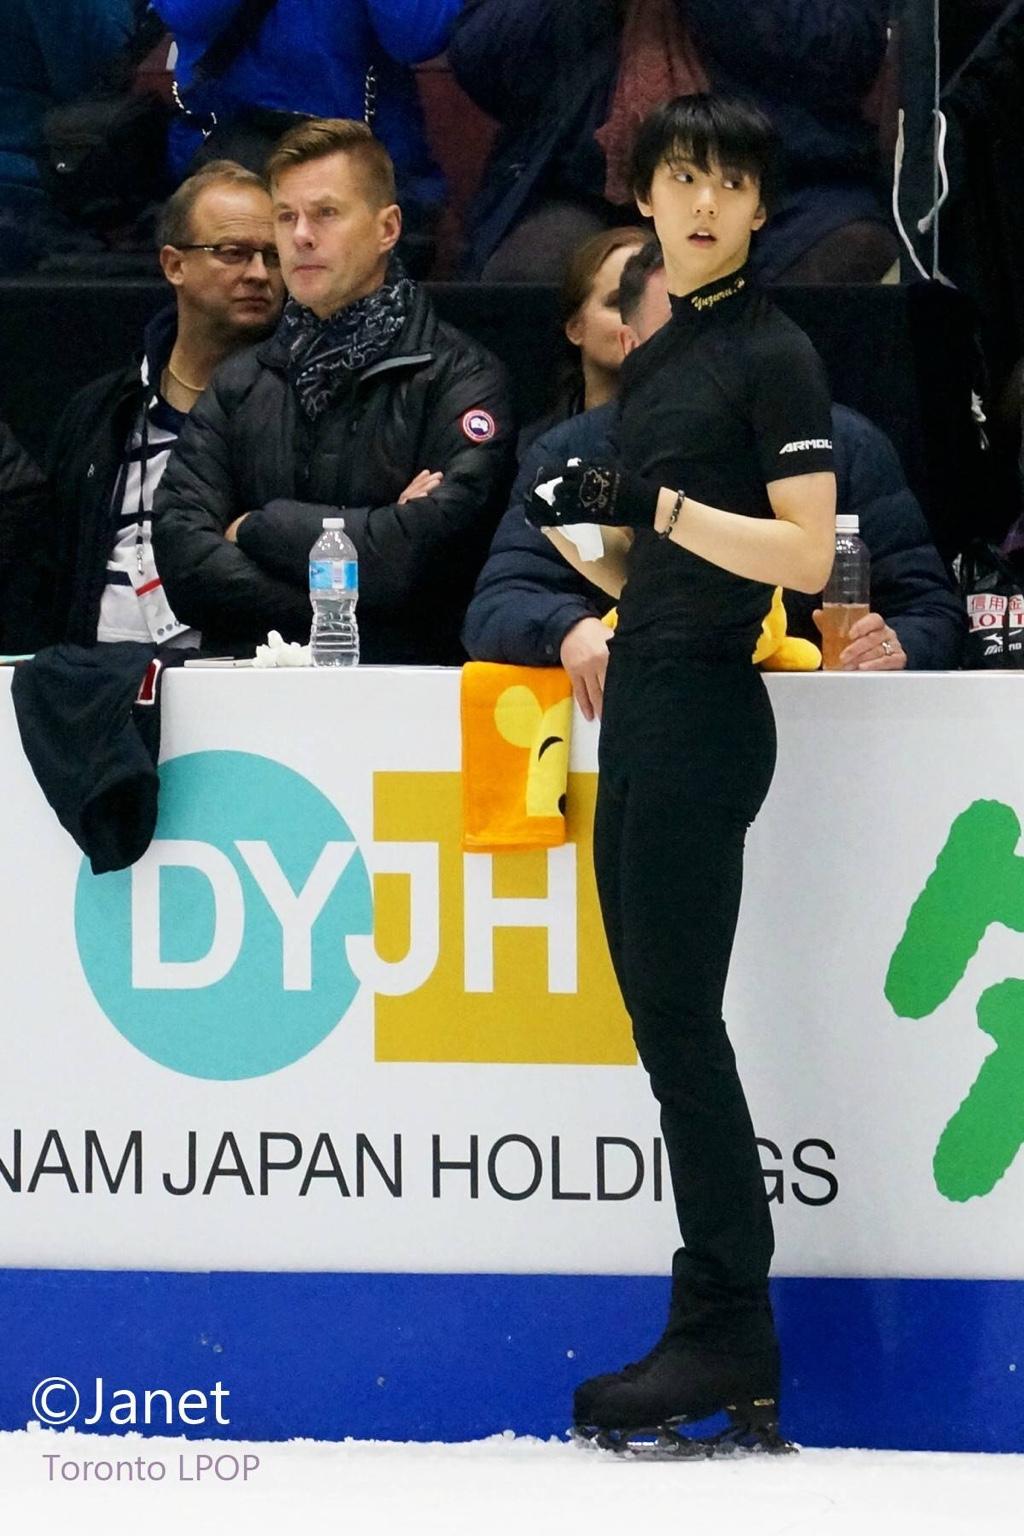 Yuzuru Hanyu Pyeongchang Olympic Memorial Skating 2019 Calendar 2-side Be